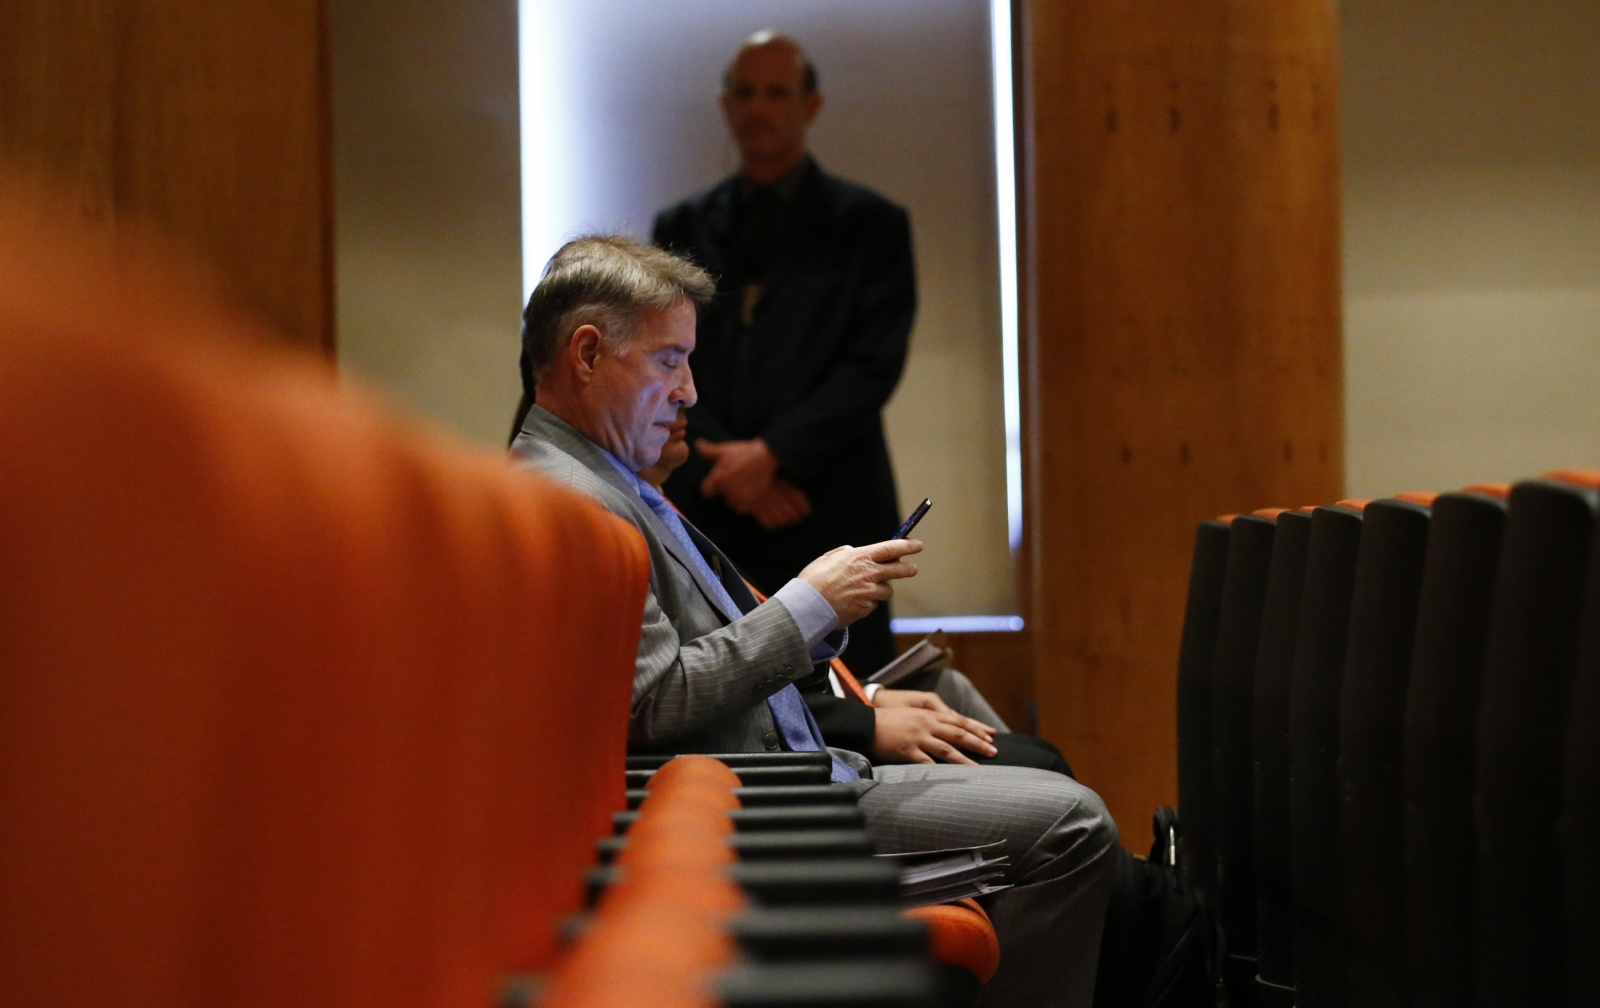 Brazilian tycoon Eike Batista checks his mobile phone before his court hearing in Rio de Janeiro November 18, 2014.